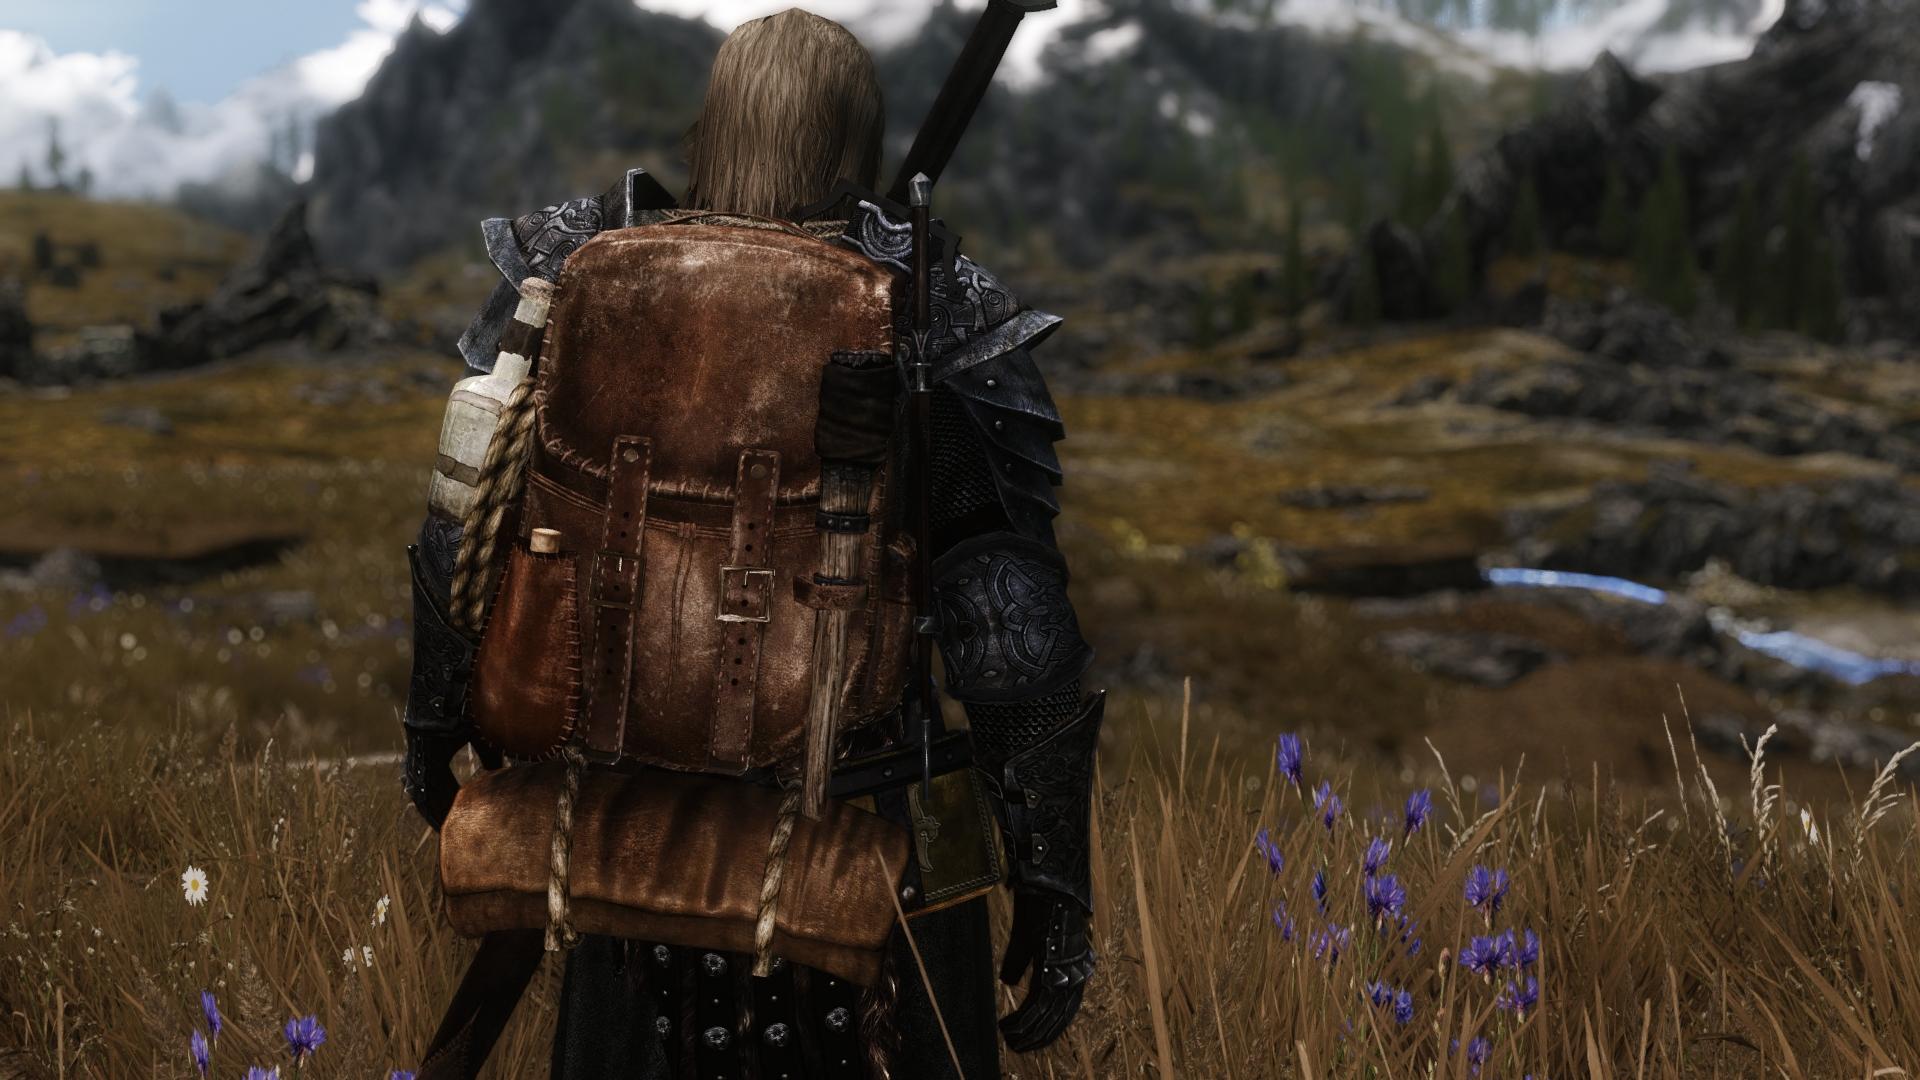 Adventurer's Backpack